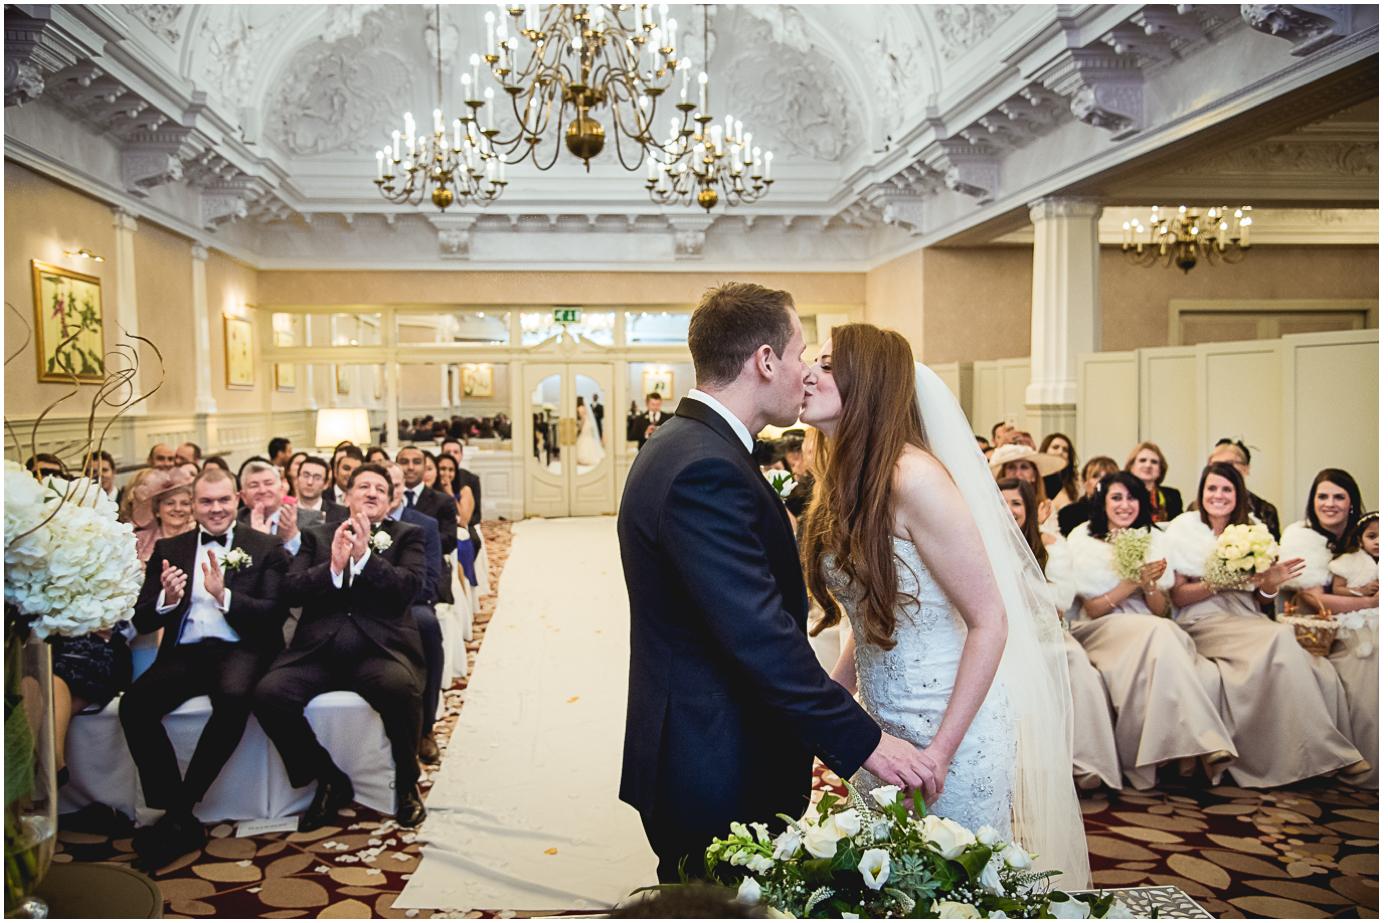 37 - Esmat and Angus - St. Ermin's Hotel London wedding photographer